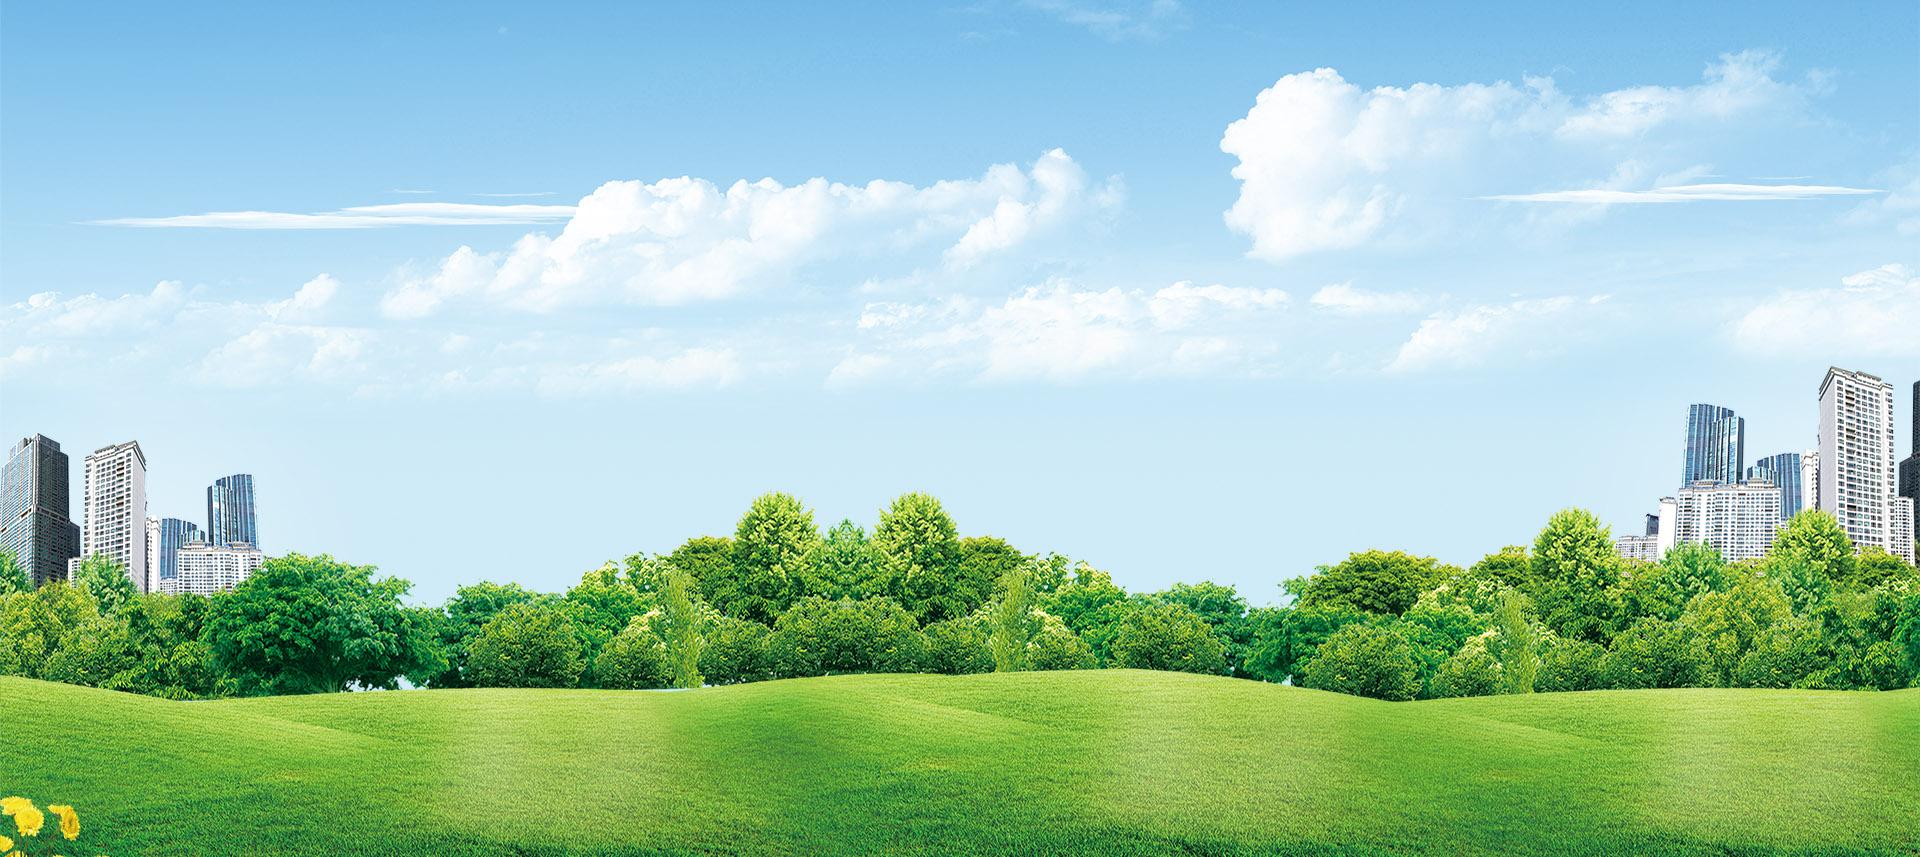 de l herbe de gazon vert pelouse prairies image de fond